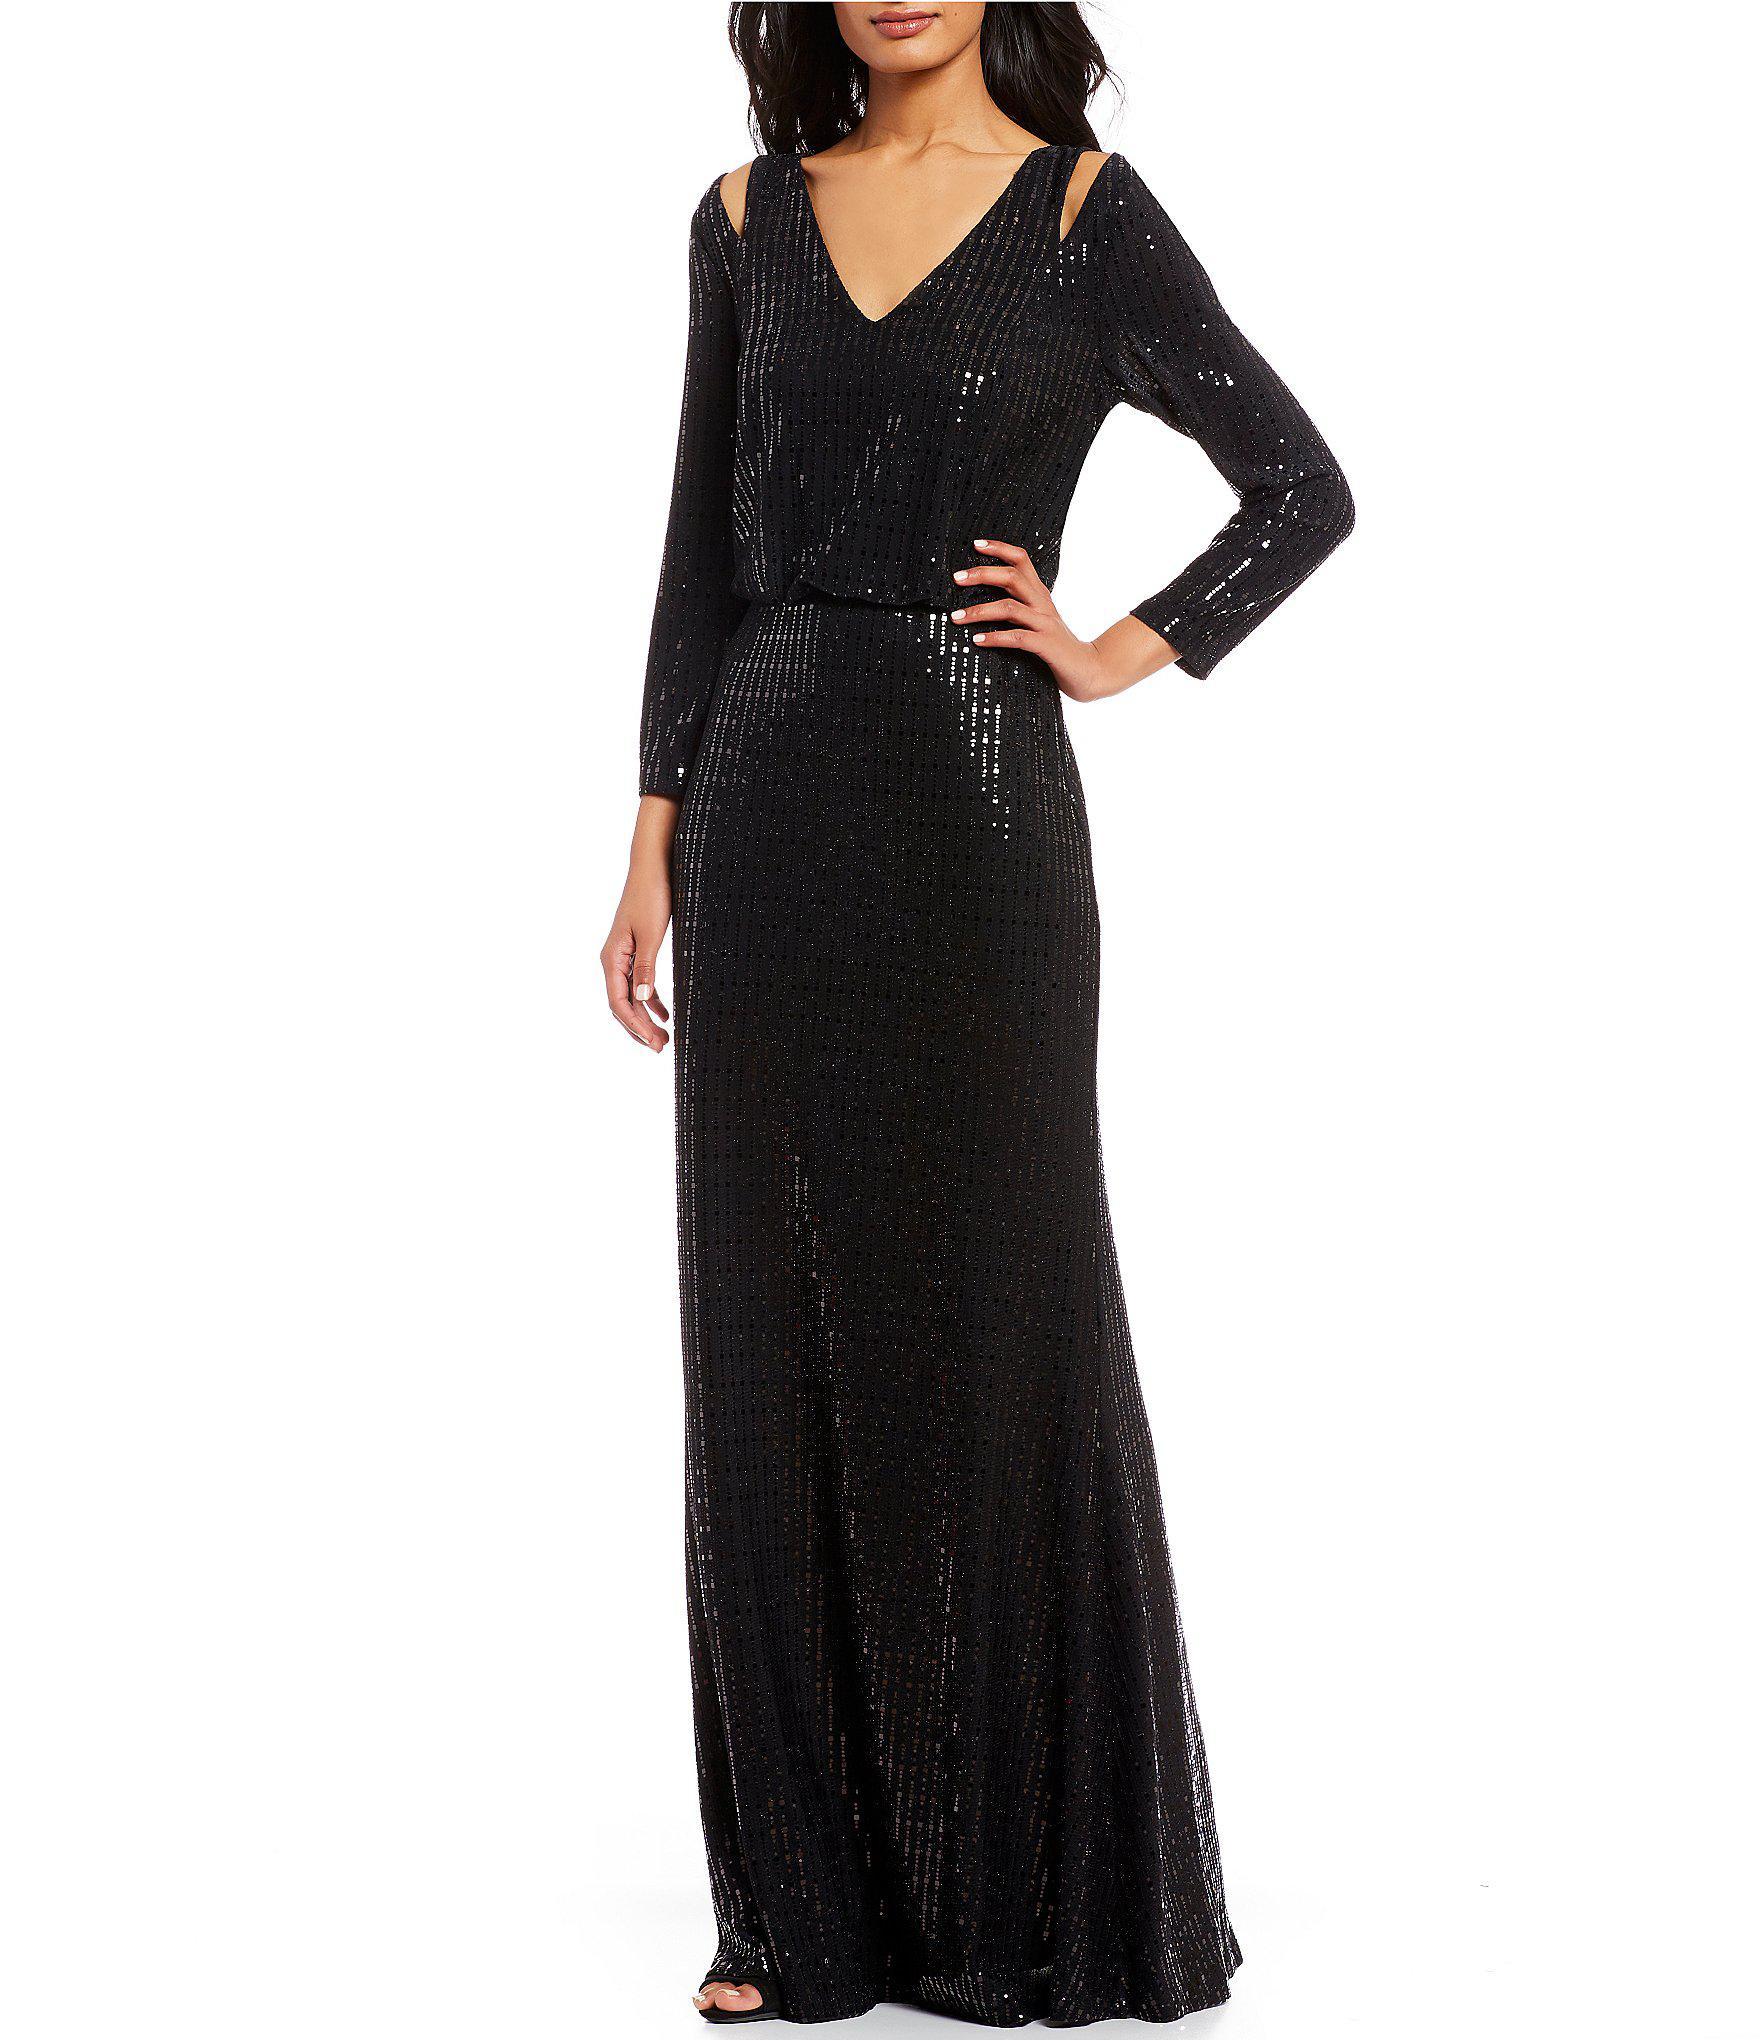 1c54150a1fb3 Calvin Klein V-neck 3/4 Sleeve Sequin Blouson Gown in Black - Lyst